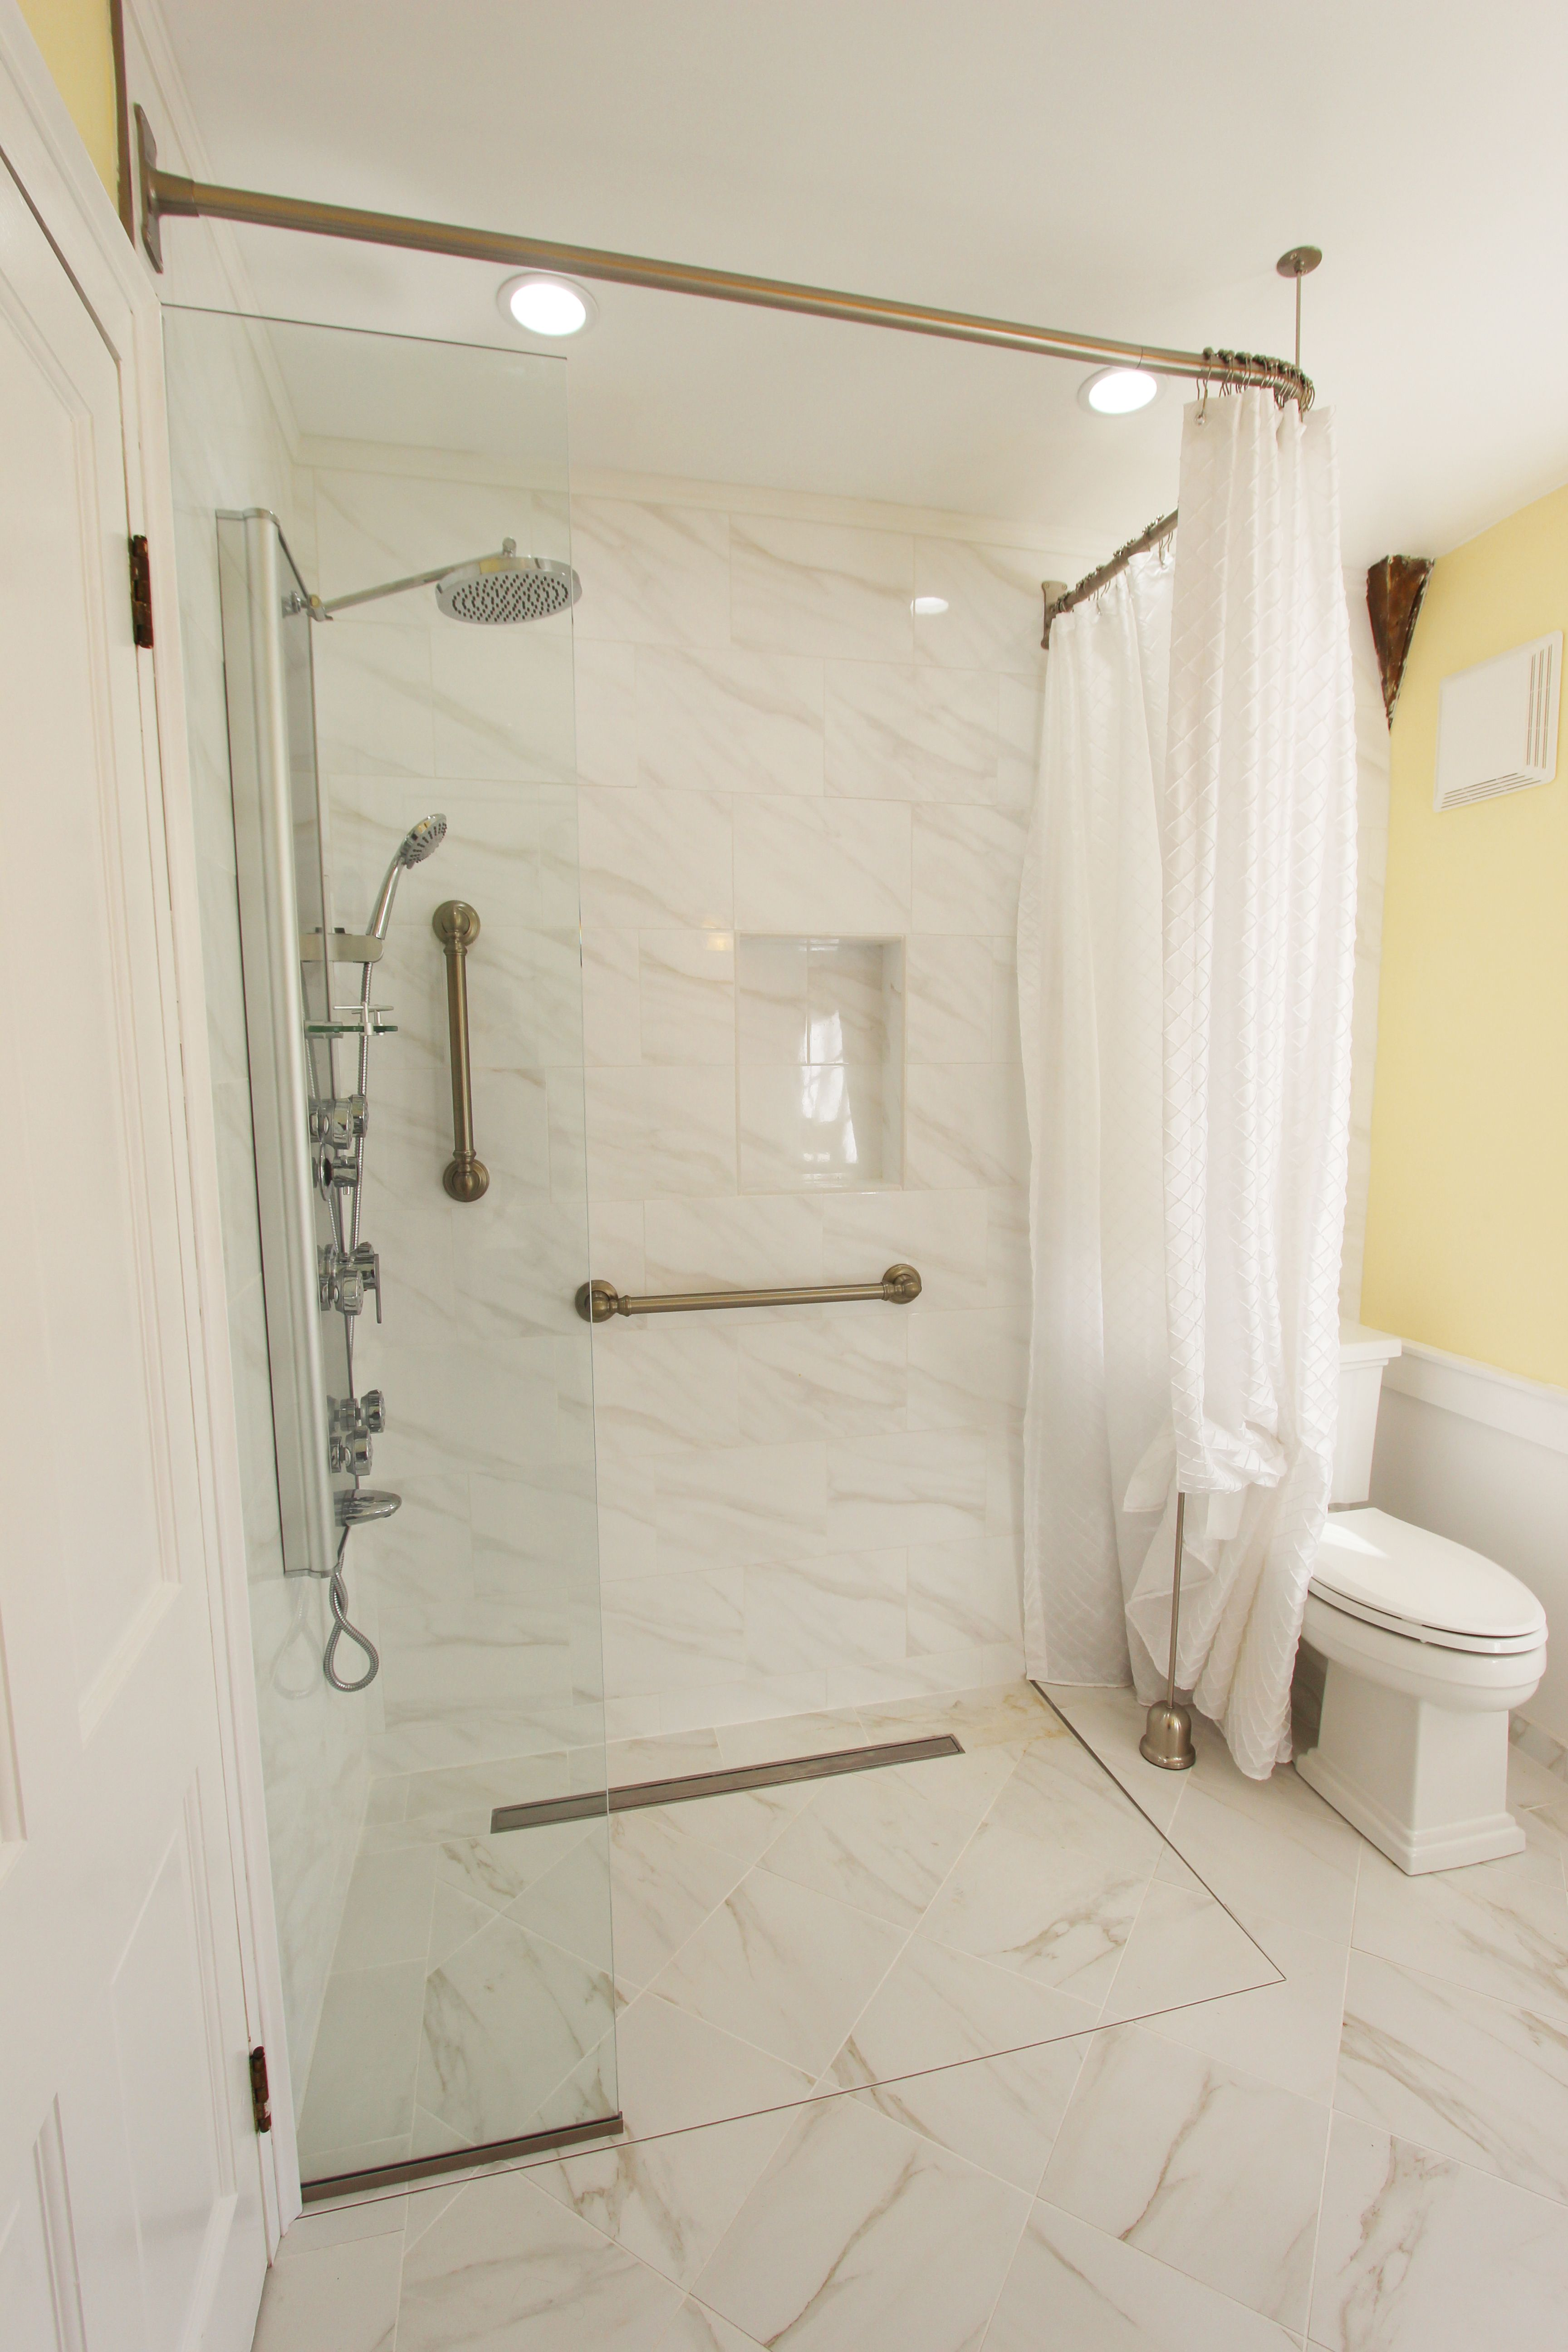 Zero Entry Walk In Shower Shower Remodel Tub To Shower Remodel